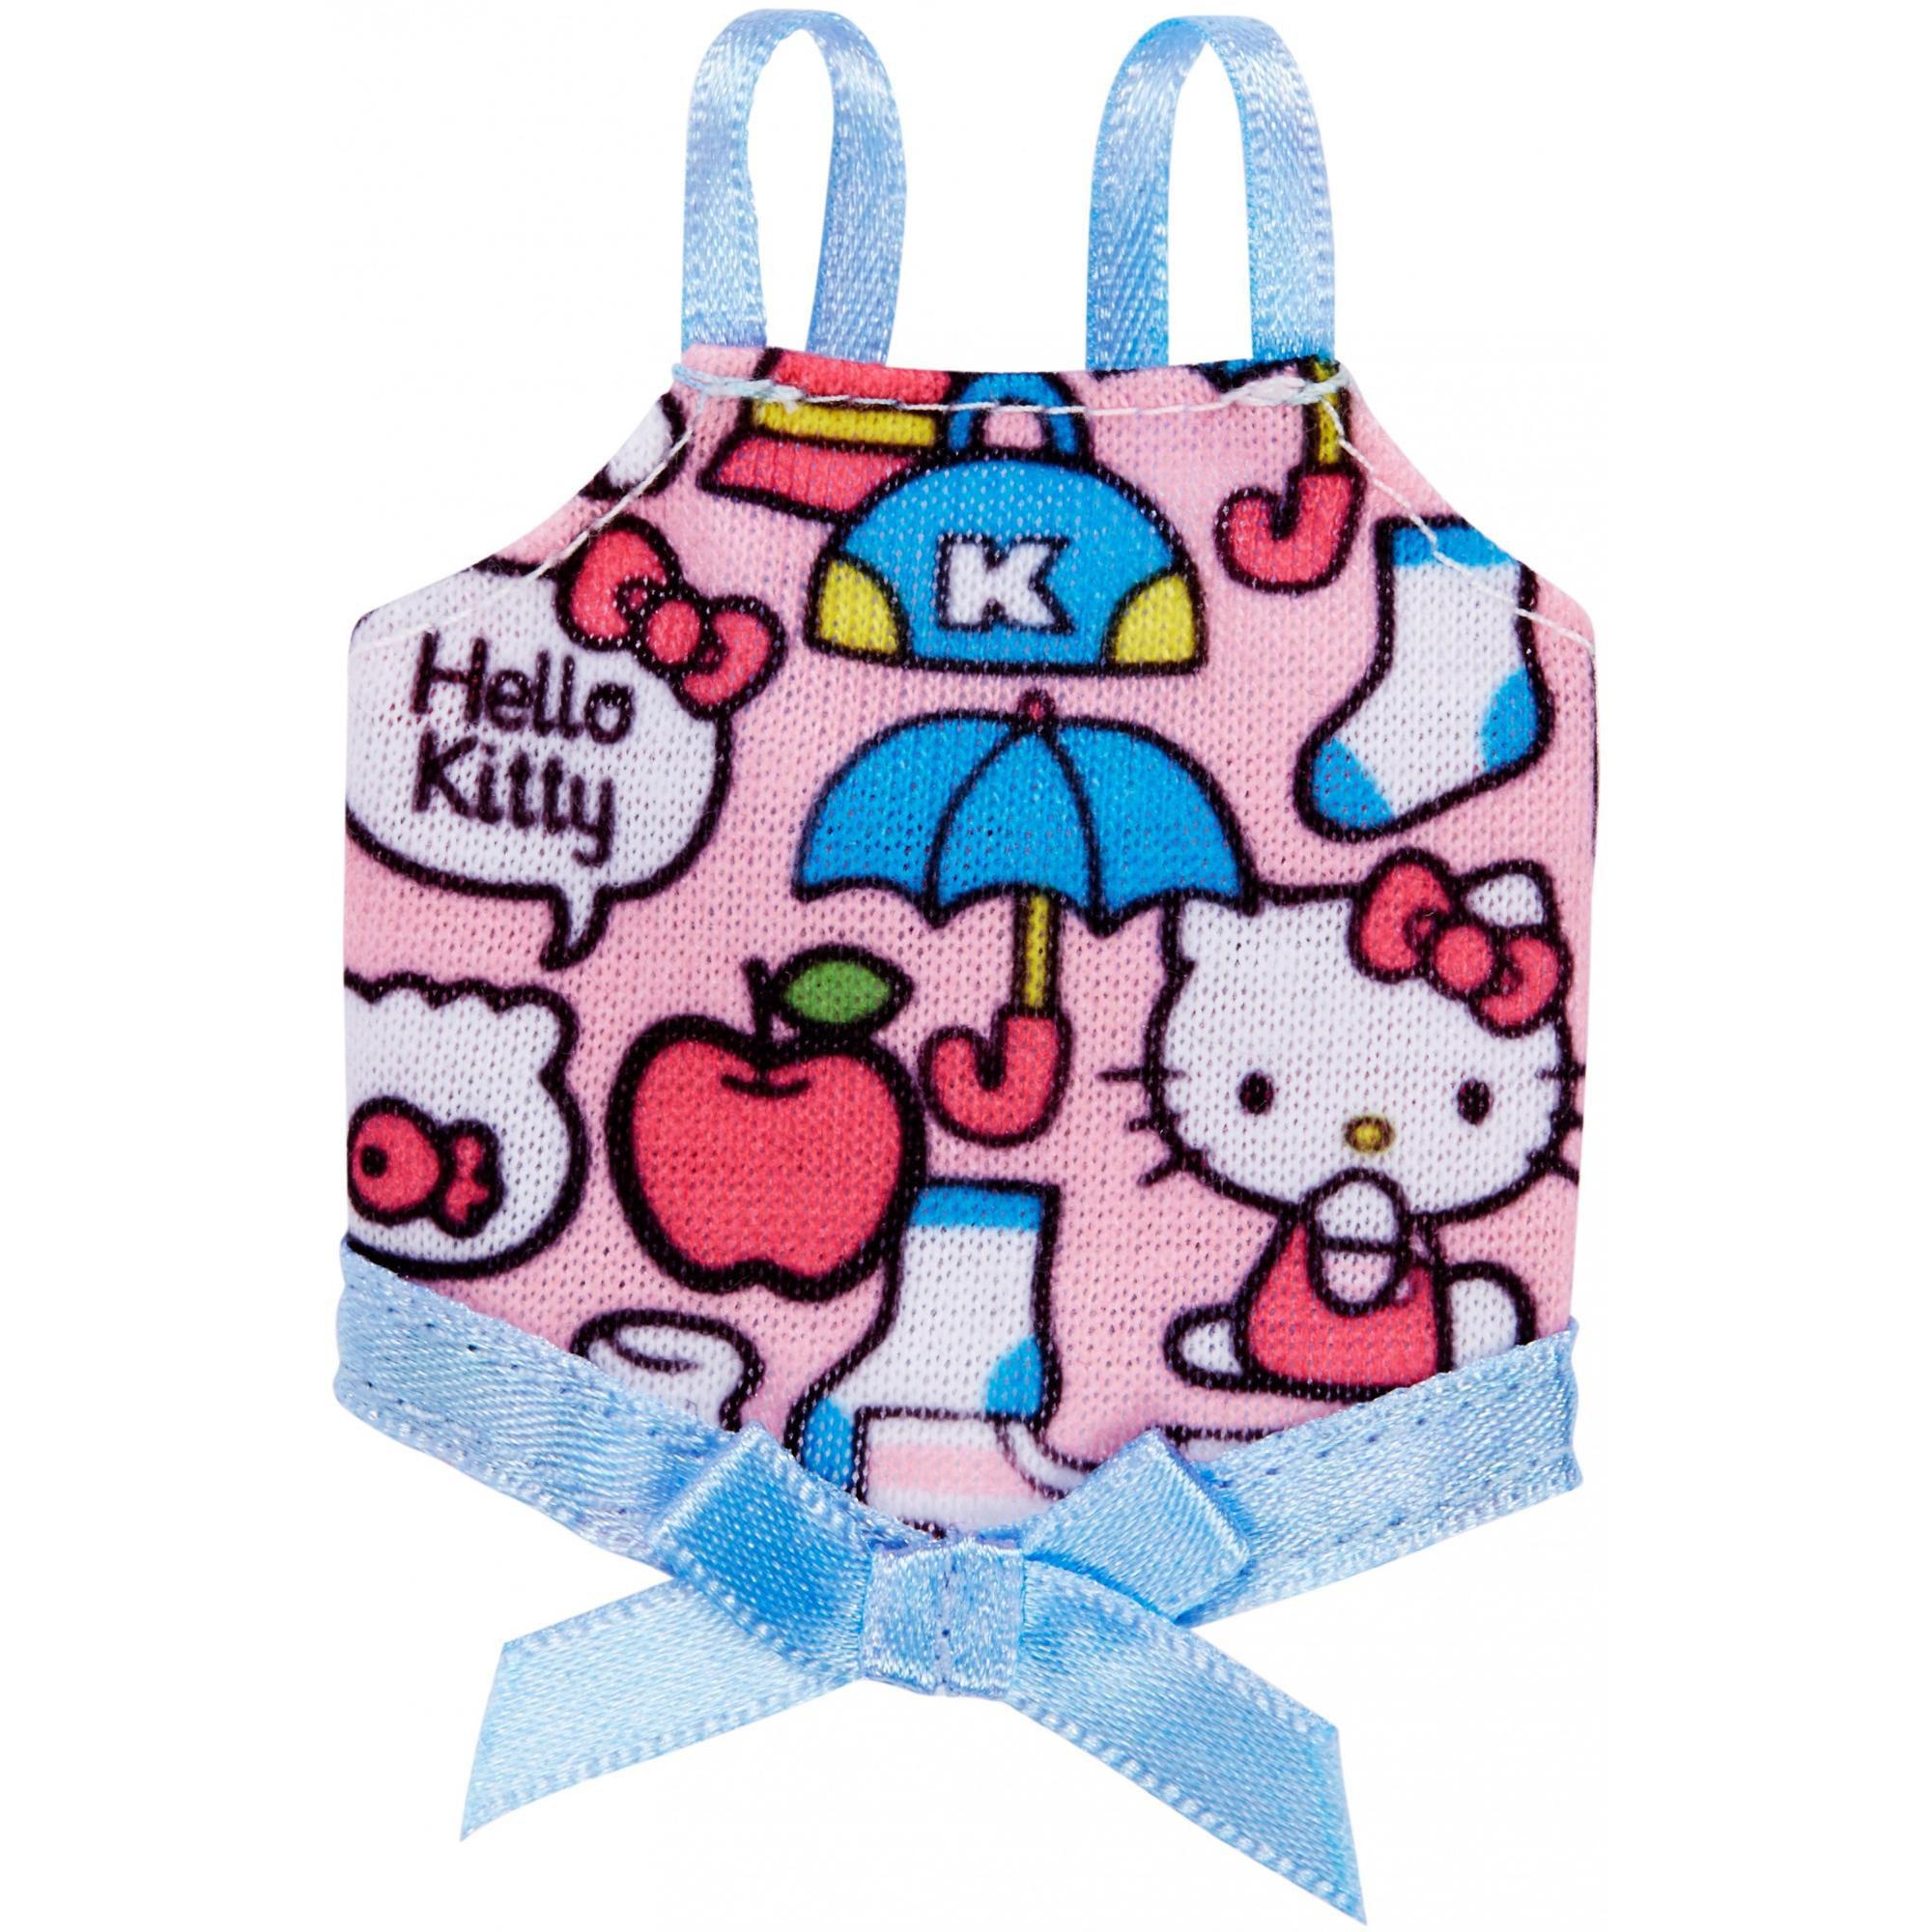 Barbie Hello Kitty Pink W Blue Bow by Mattel